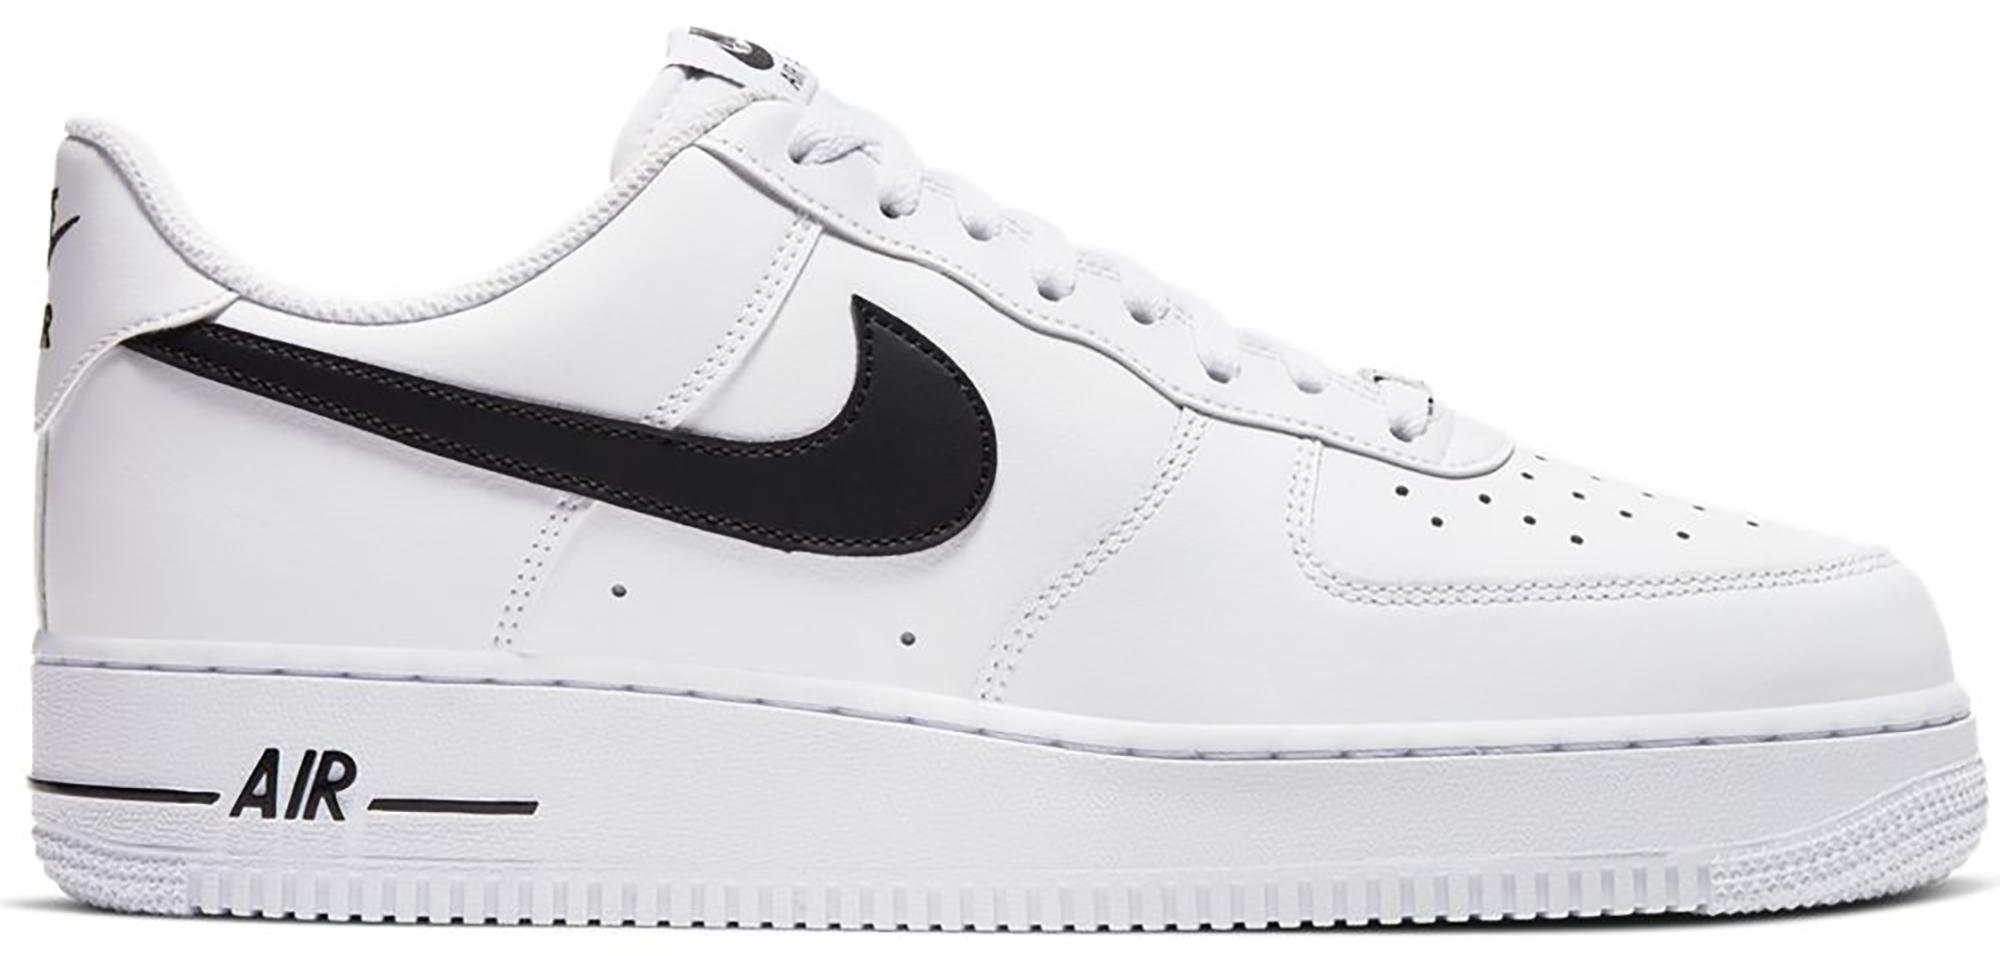 Nike Air Force 1 Low White Black (2020